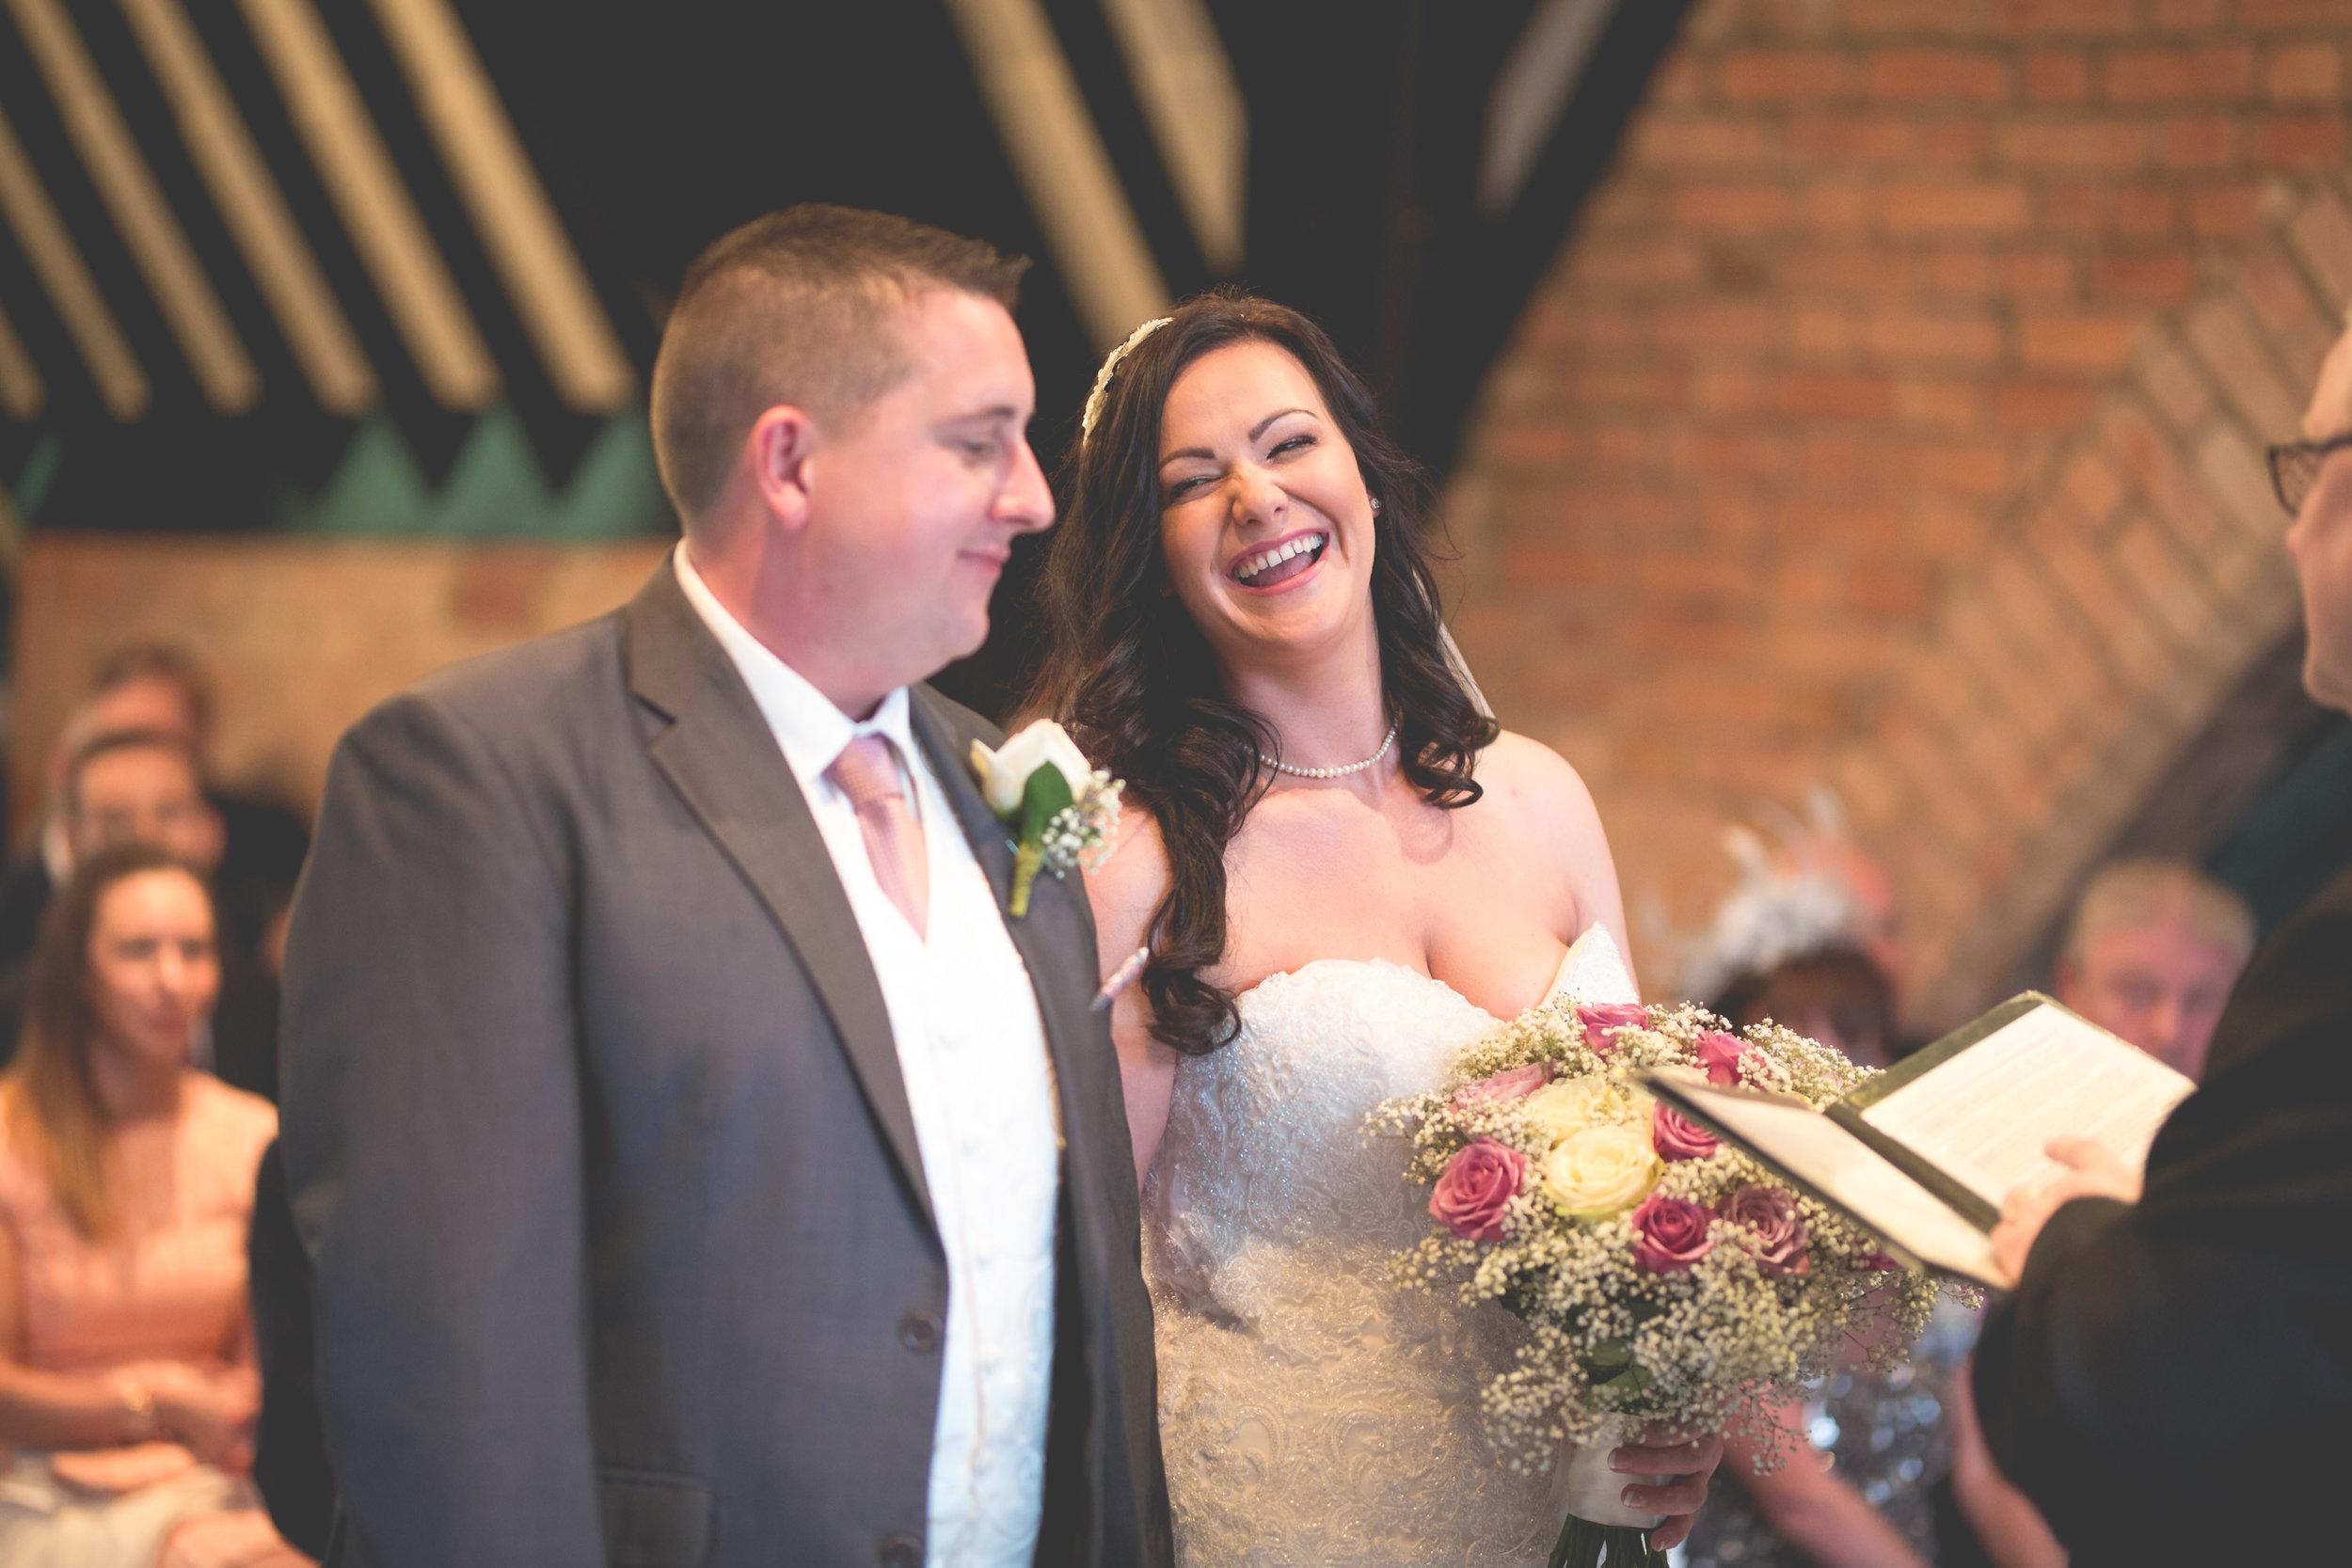 Helena & Terence - Ceremony-31.jpg